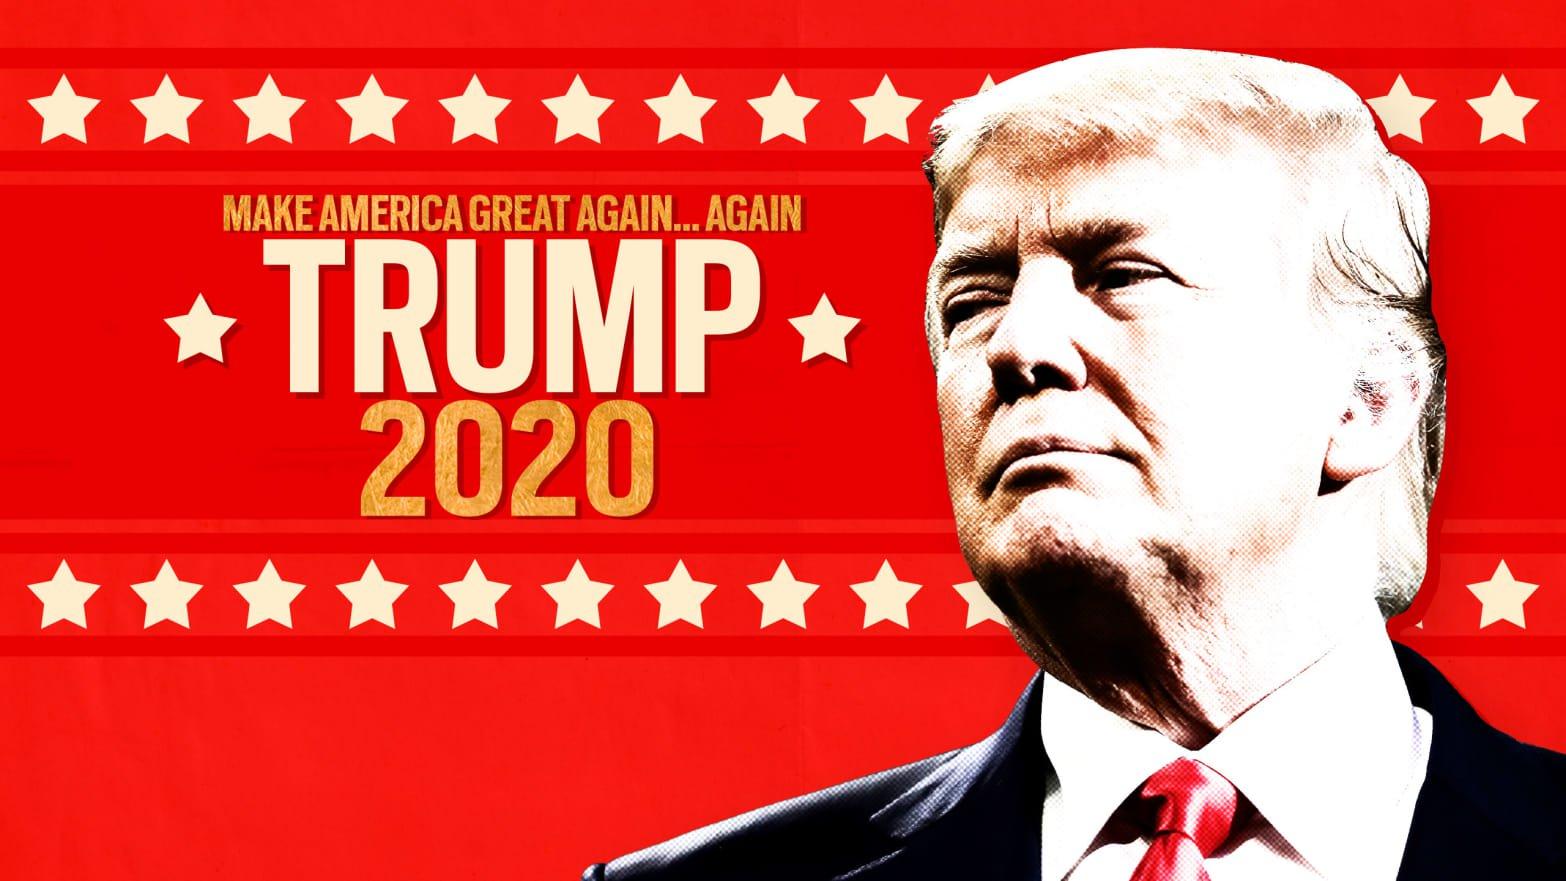 Trump 2020 1068284   HD Wallpaper Backgrounds Download 1566x881